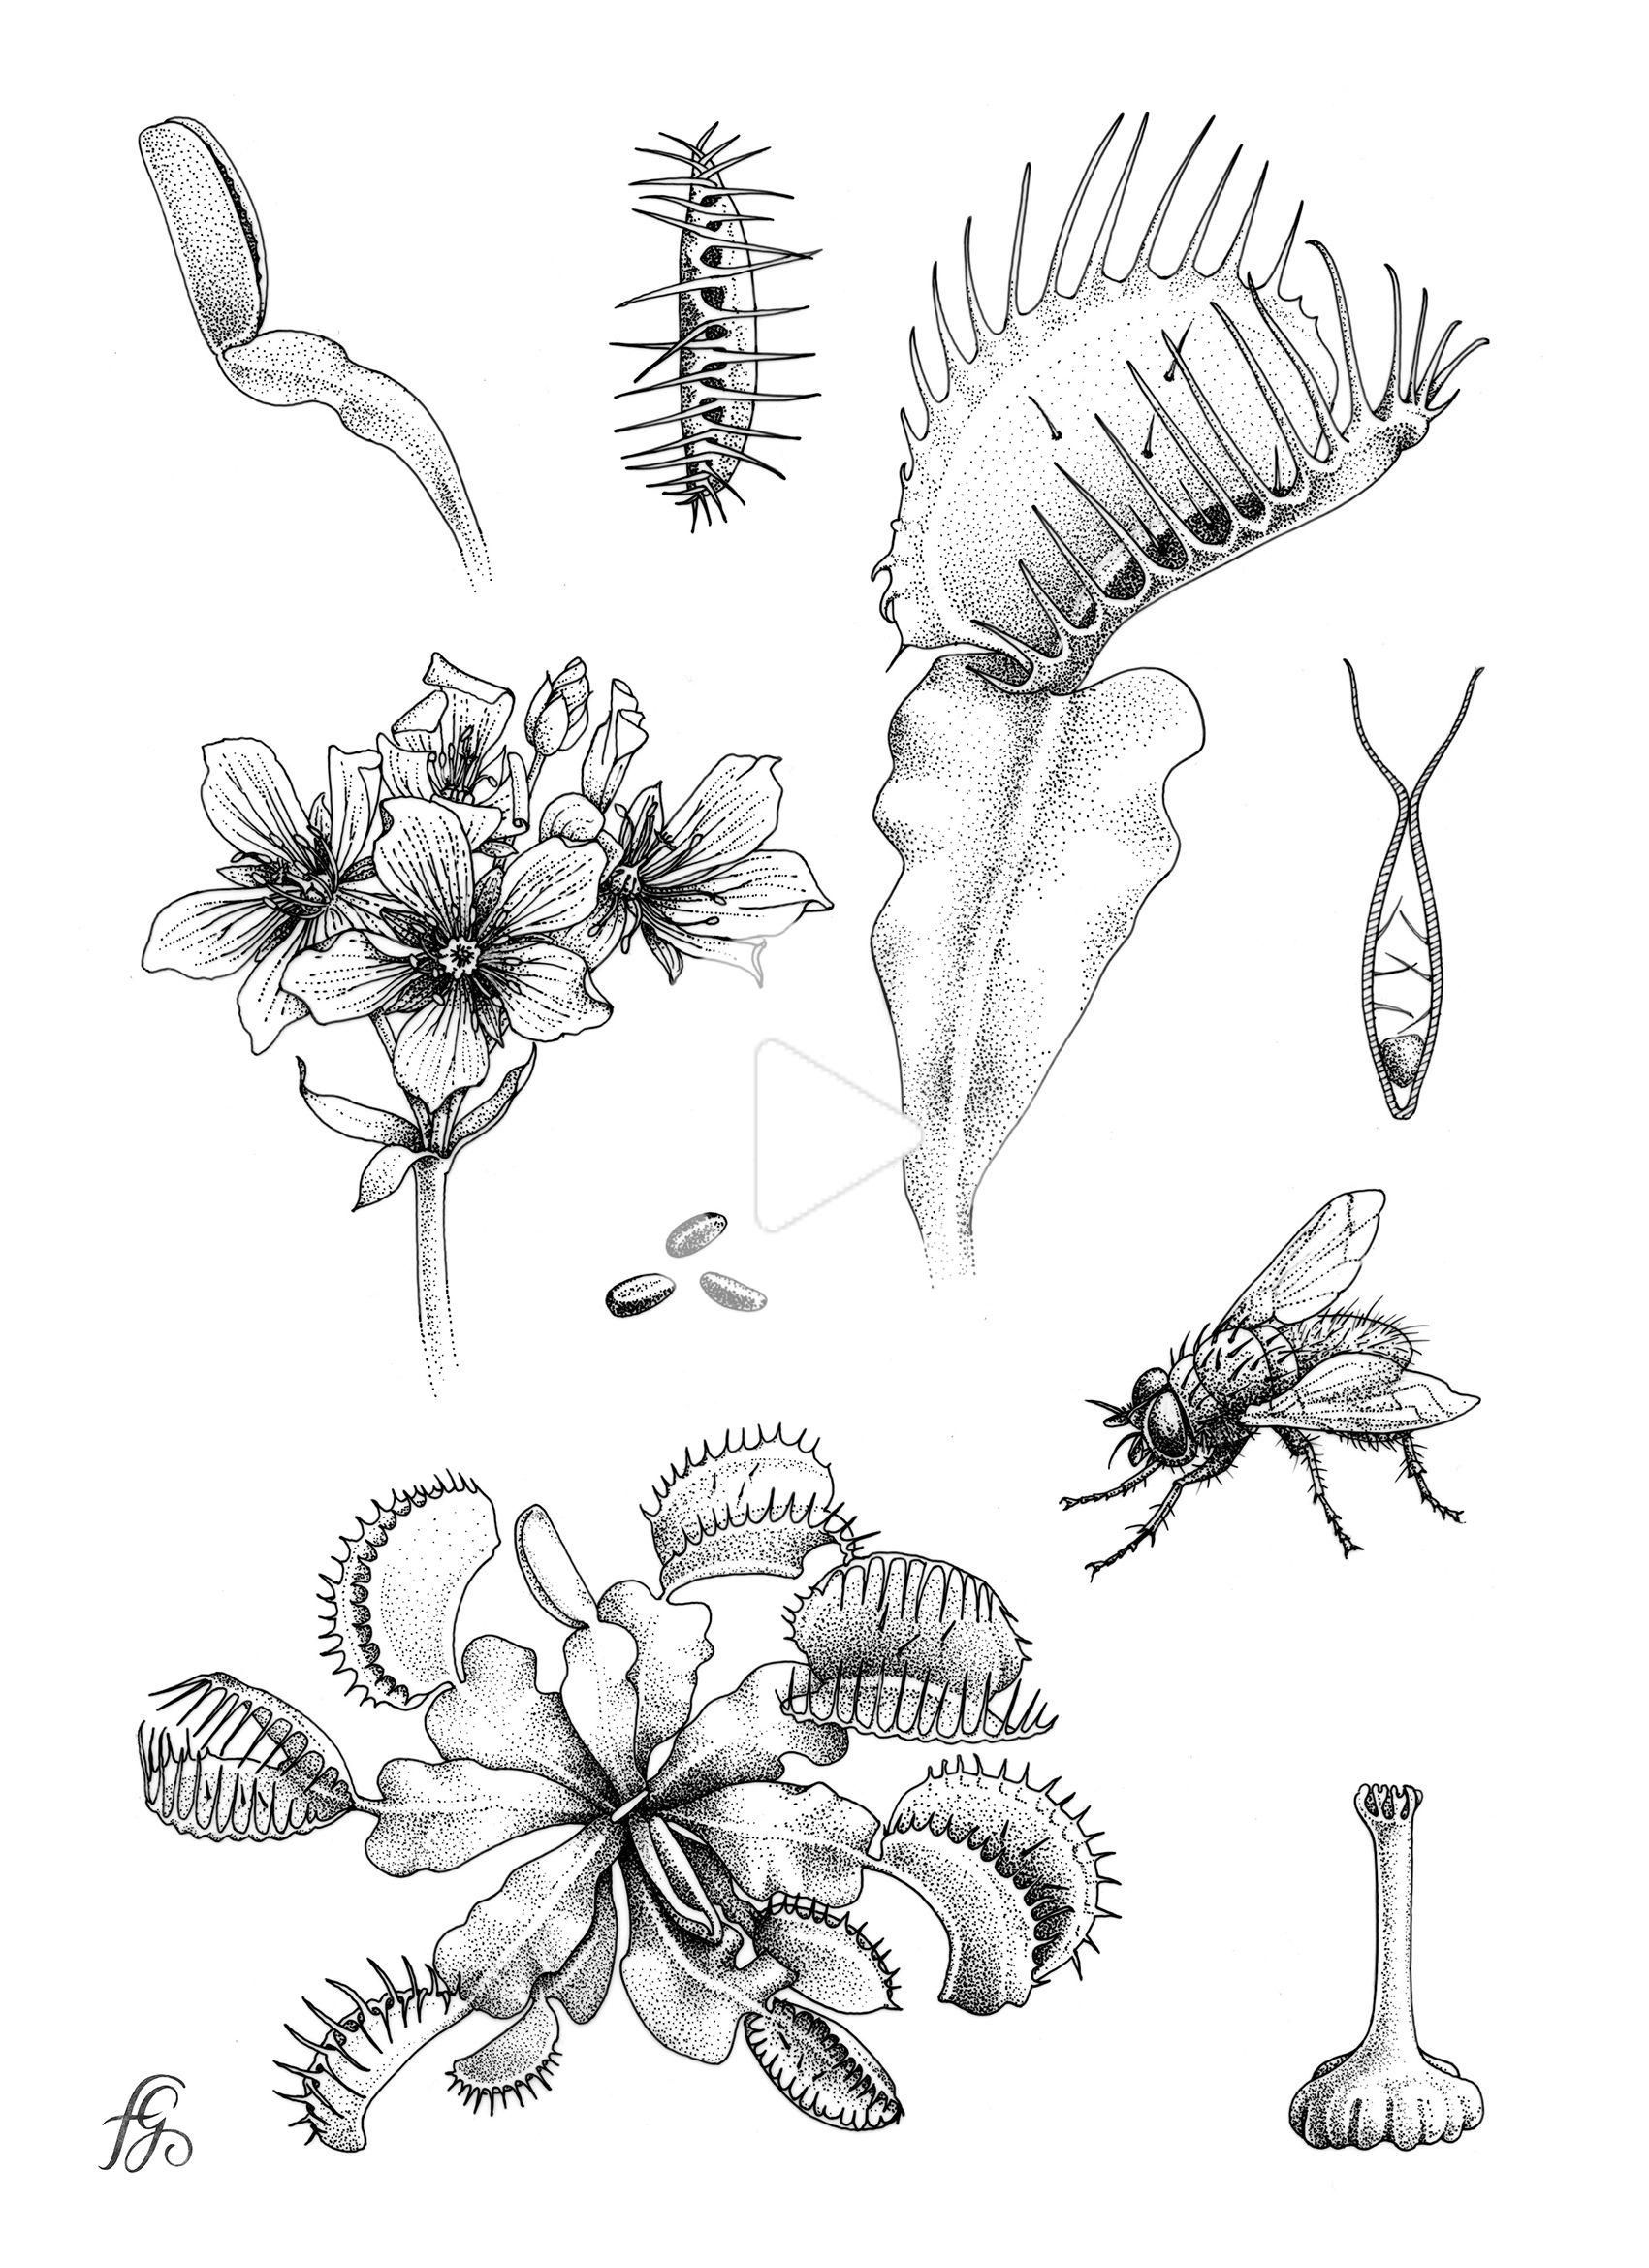 Dionée / plante carnivore in 2020 | Plant sketches, Plant ...